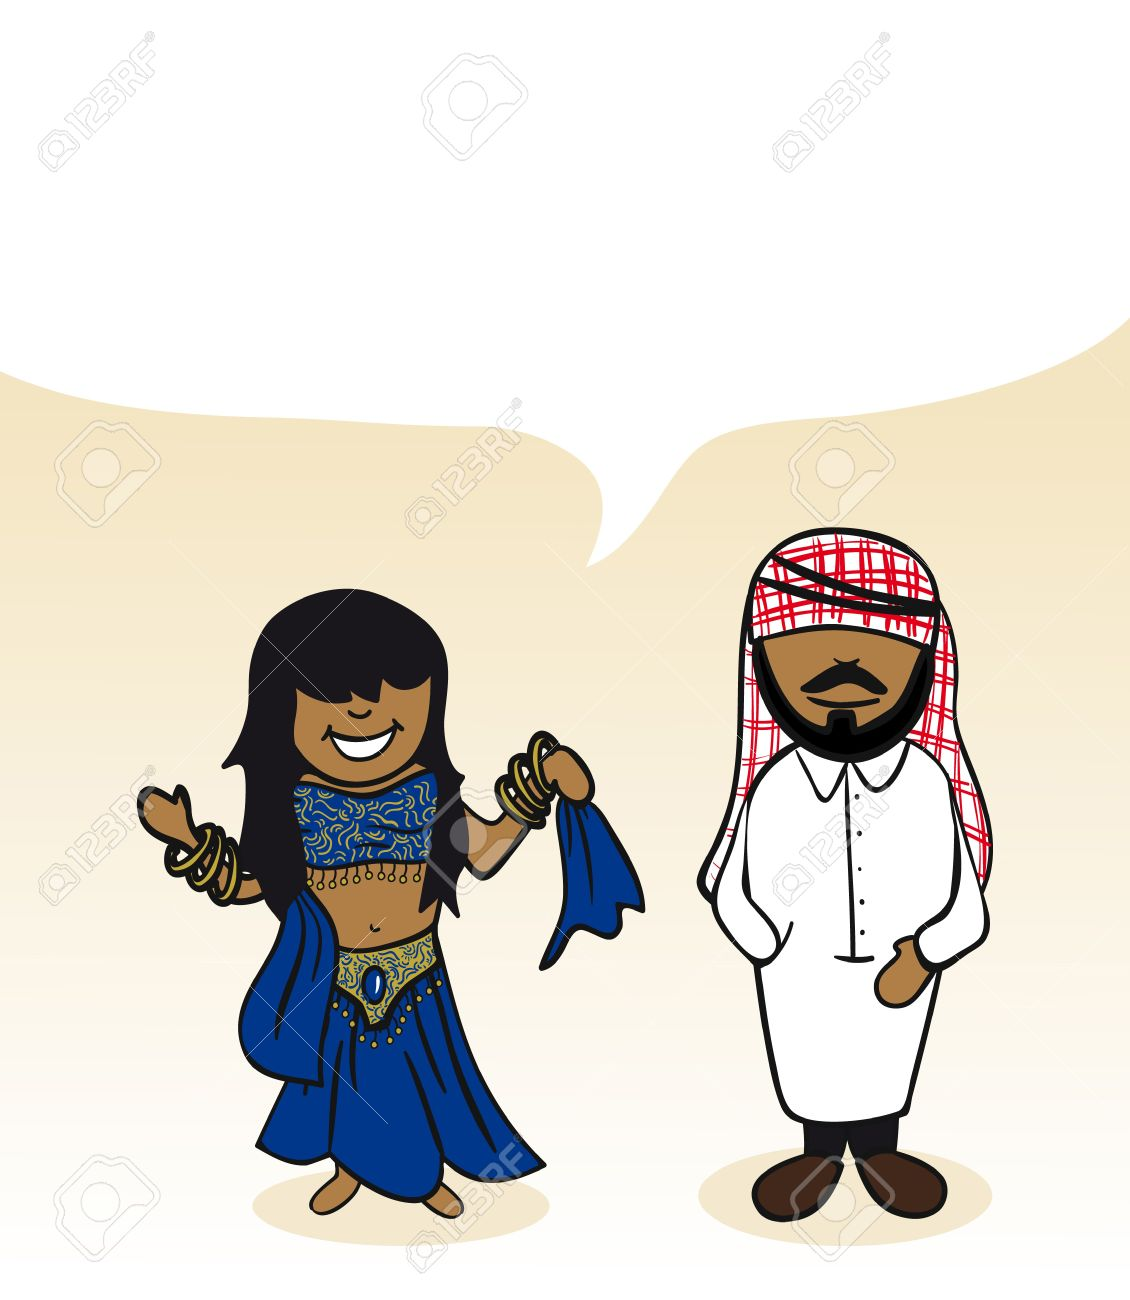 Arabian man and woman cartoon couple with social media bubble. Stock Vector - 21280303